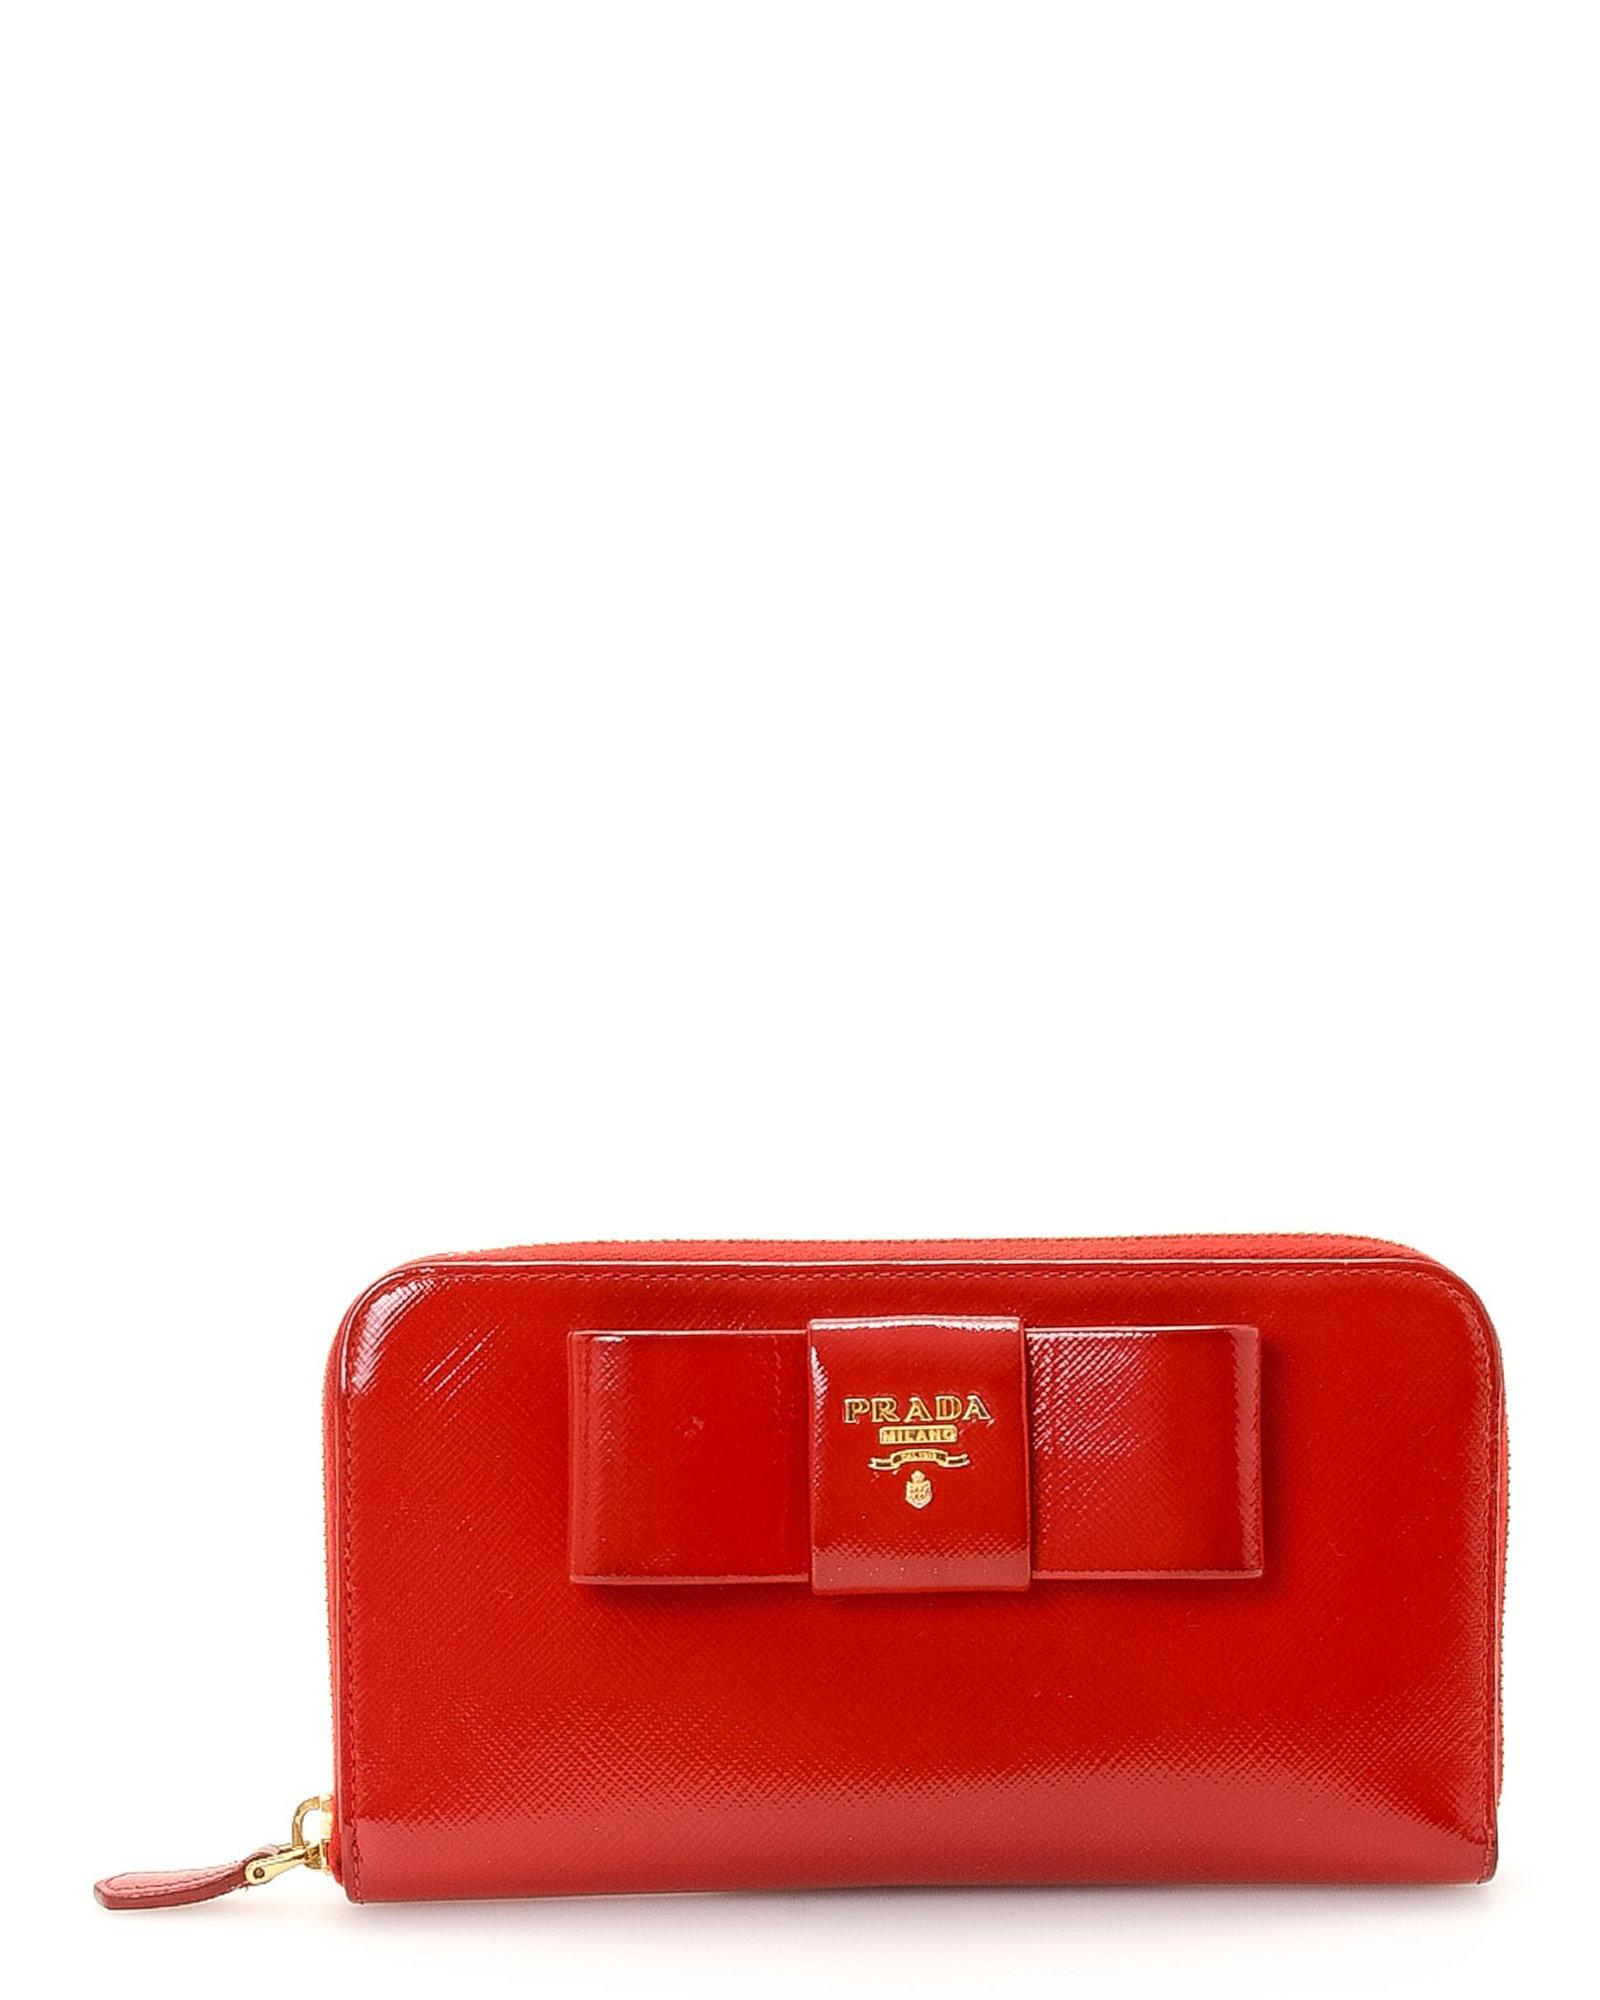 8244acb52a53 ... amazon prada red bow saffiano lux zip wallet vintage lyst. view  fullscreen 67826 2f2d3